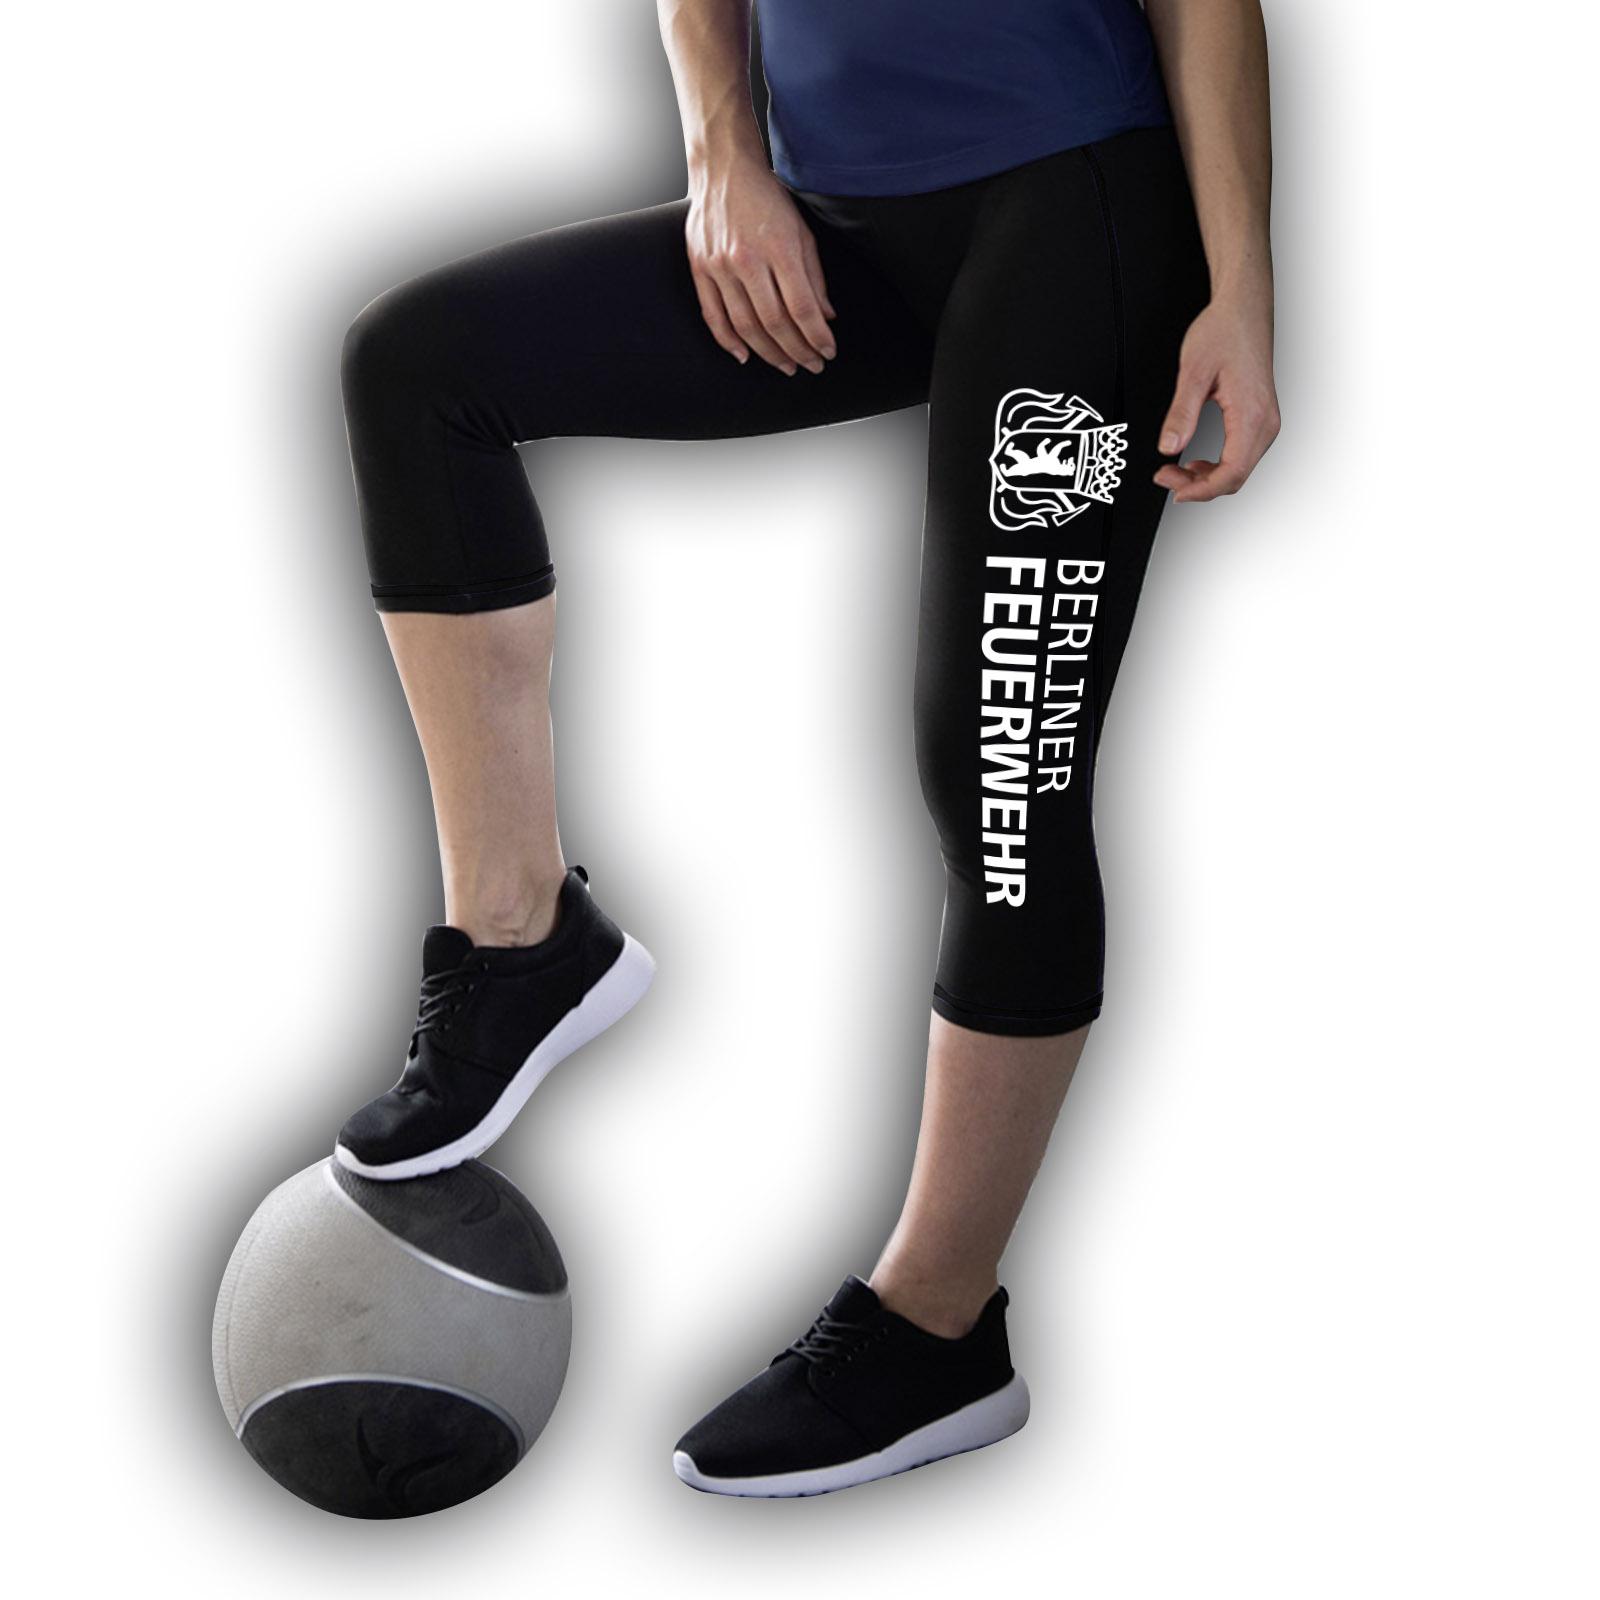 damen sport leggings 3 4 bf hauptstadtfeuerwehr. Black Bedroom Furniture Sets. Home Design Ideas